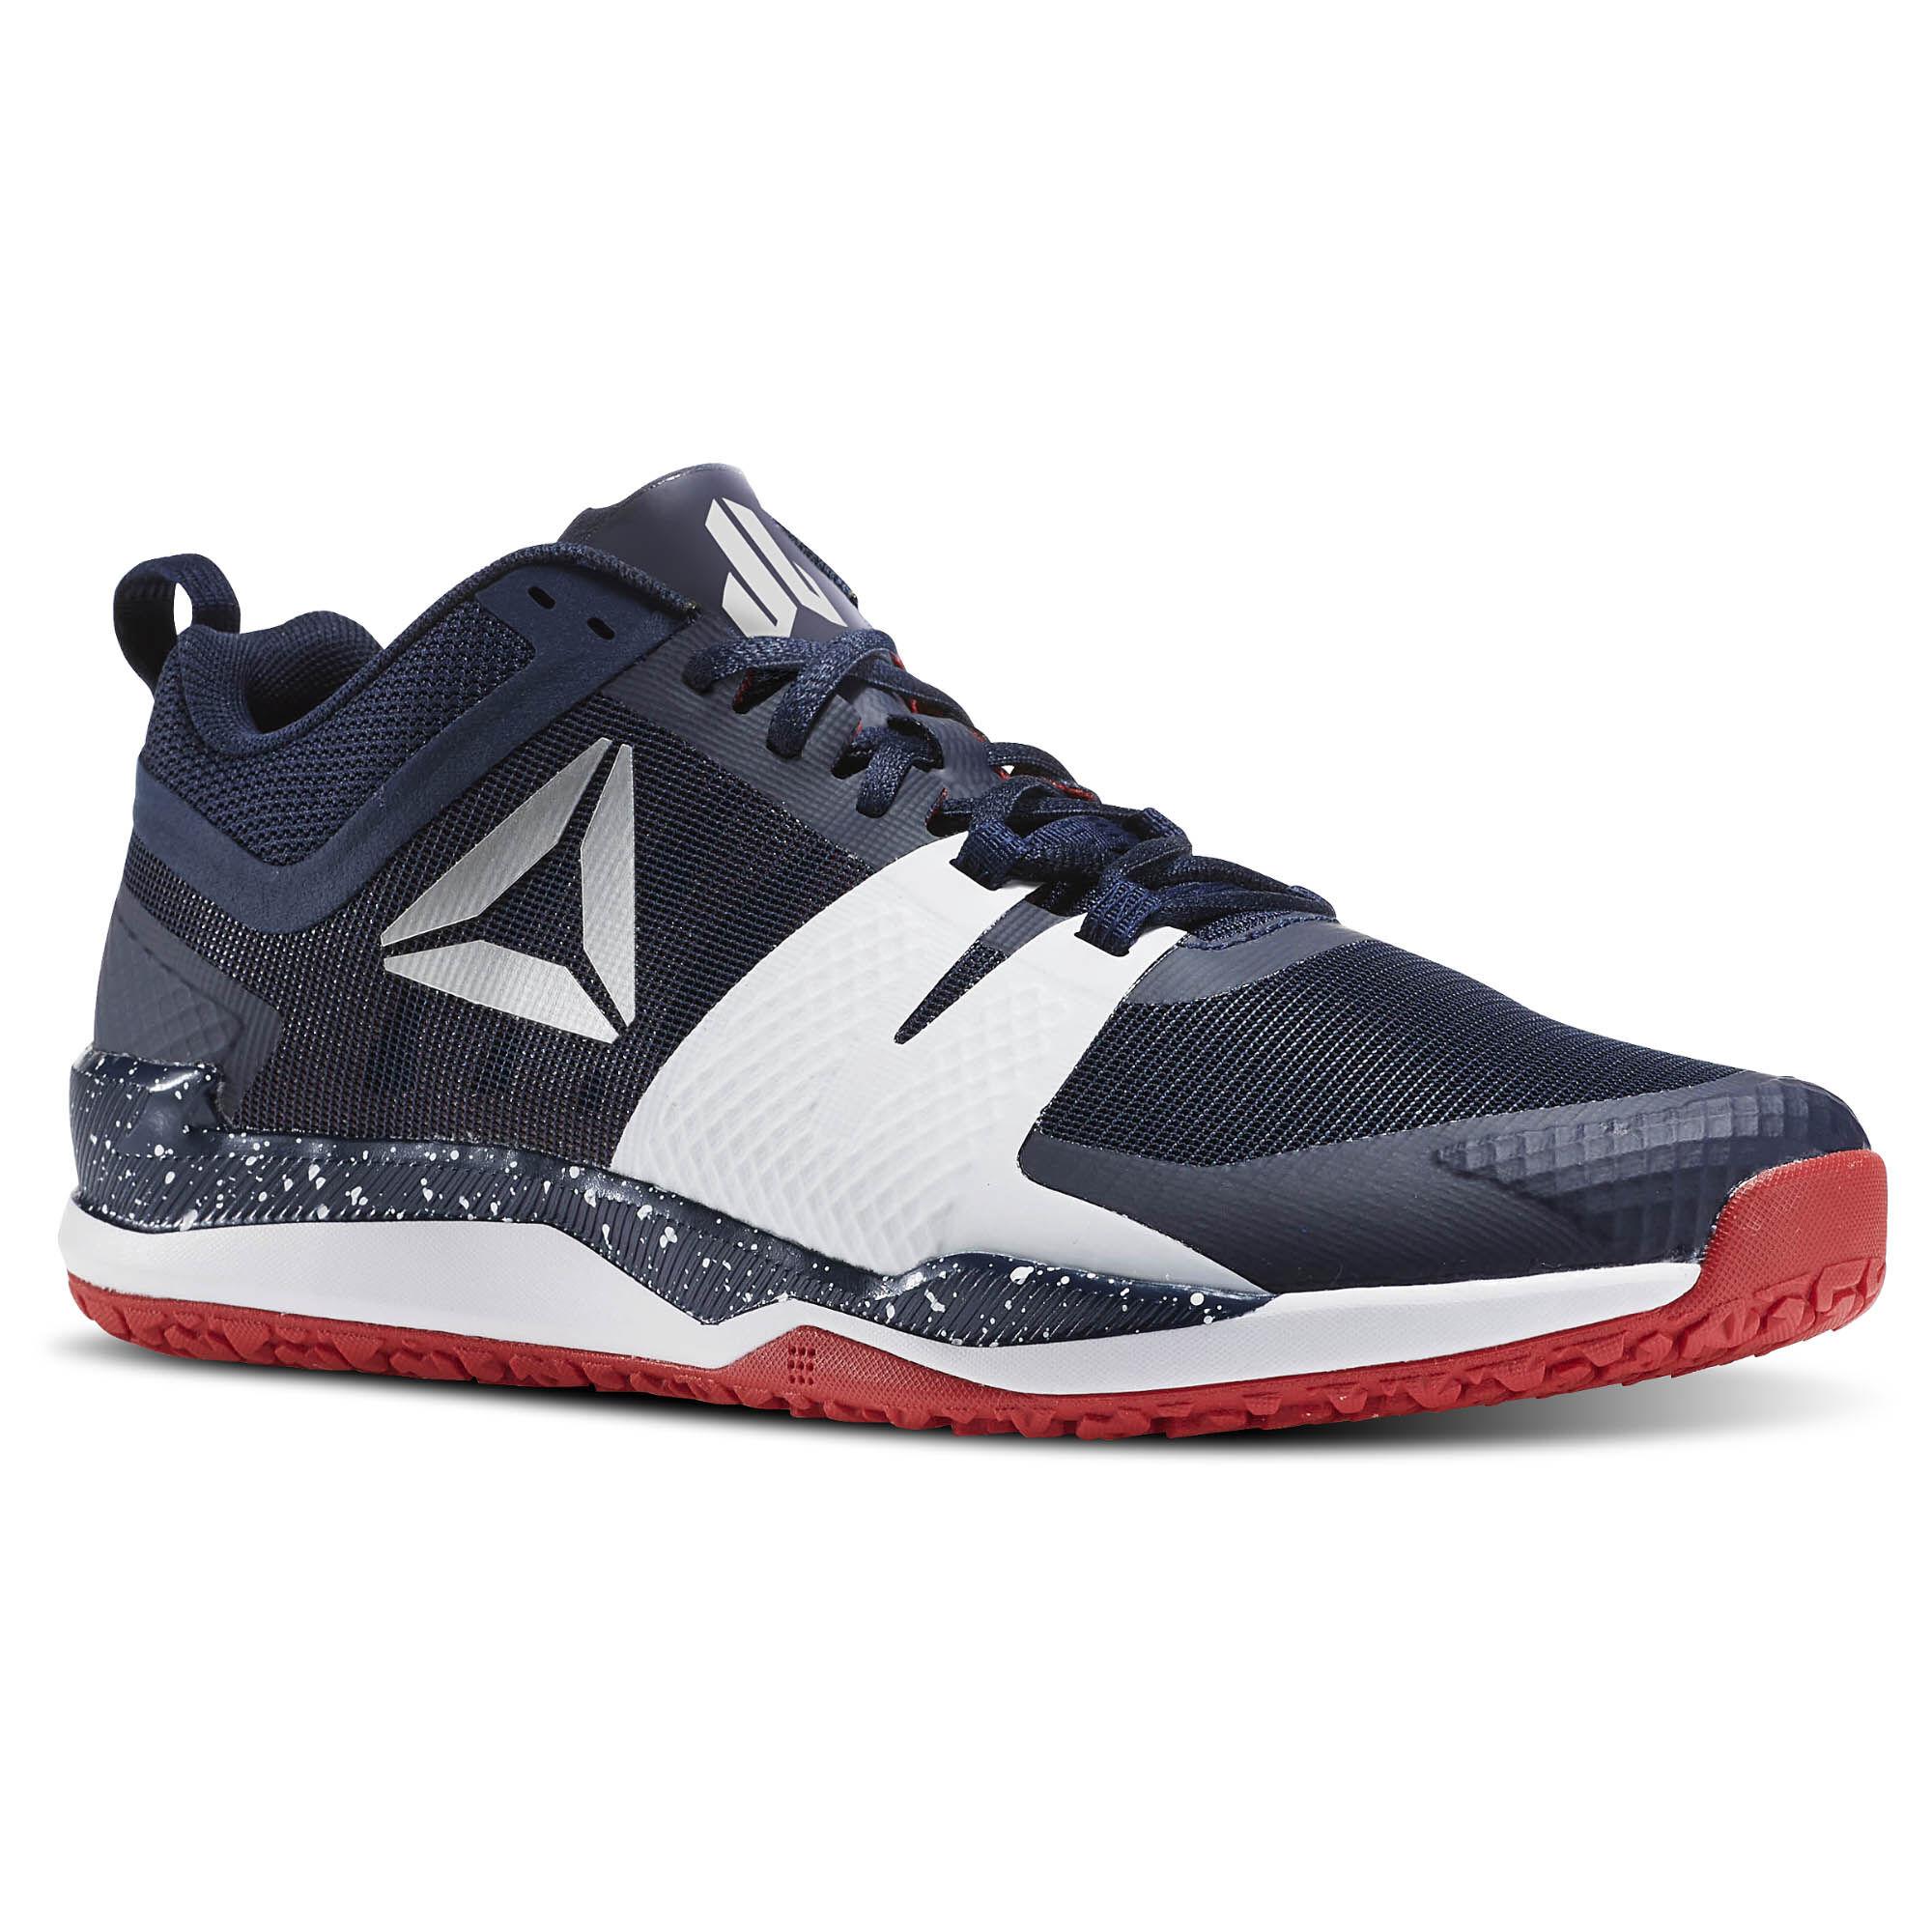 Reebok Shoes 2017